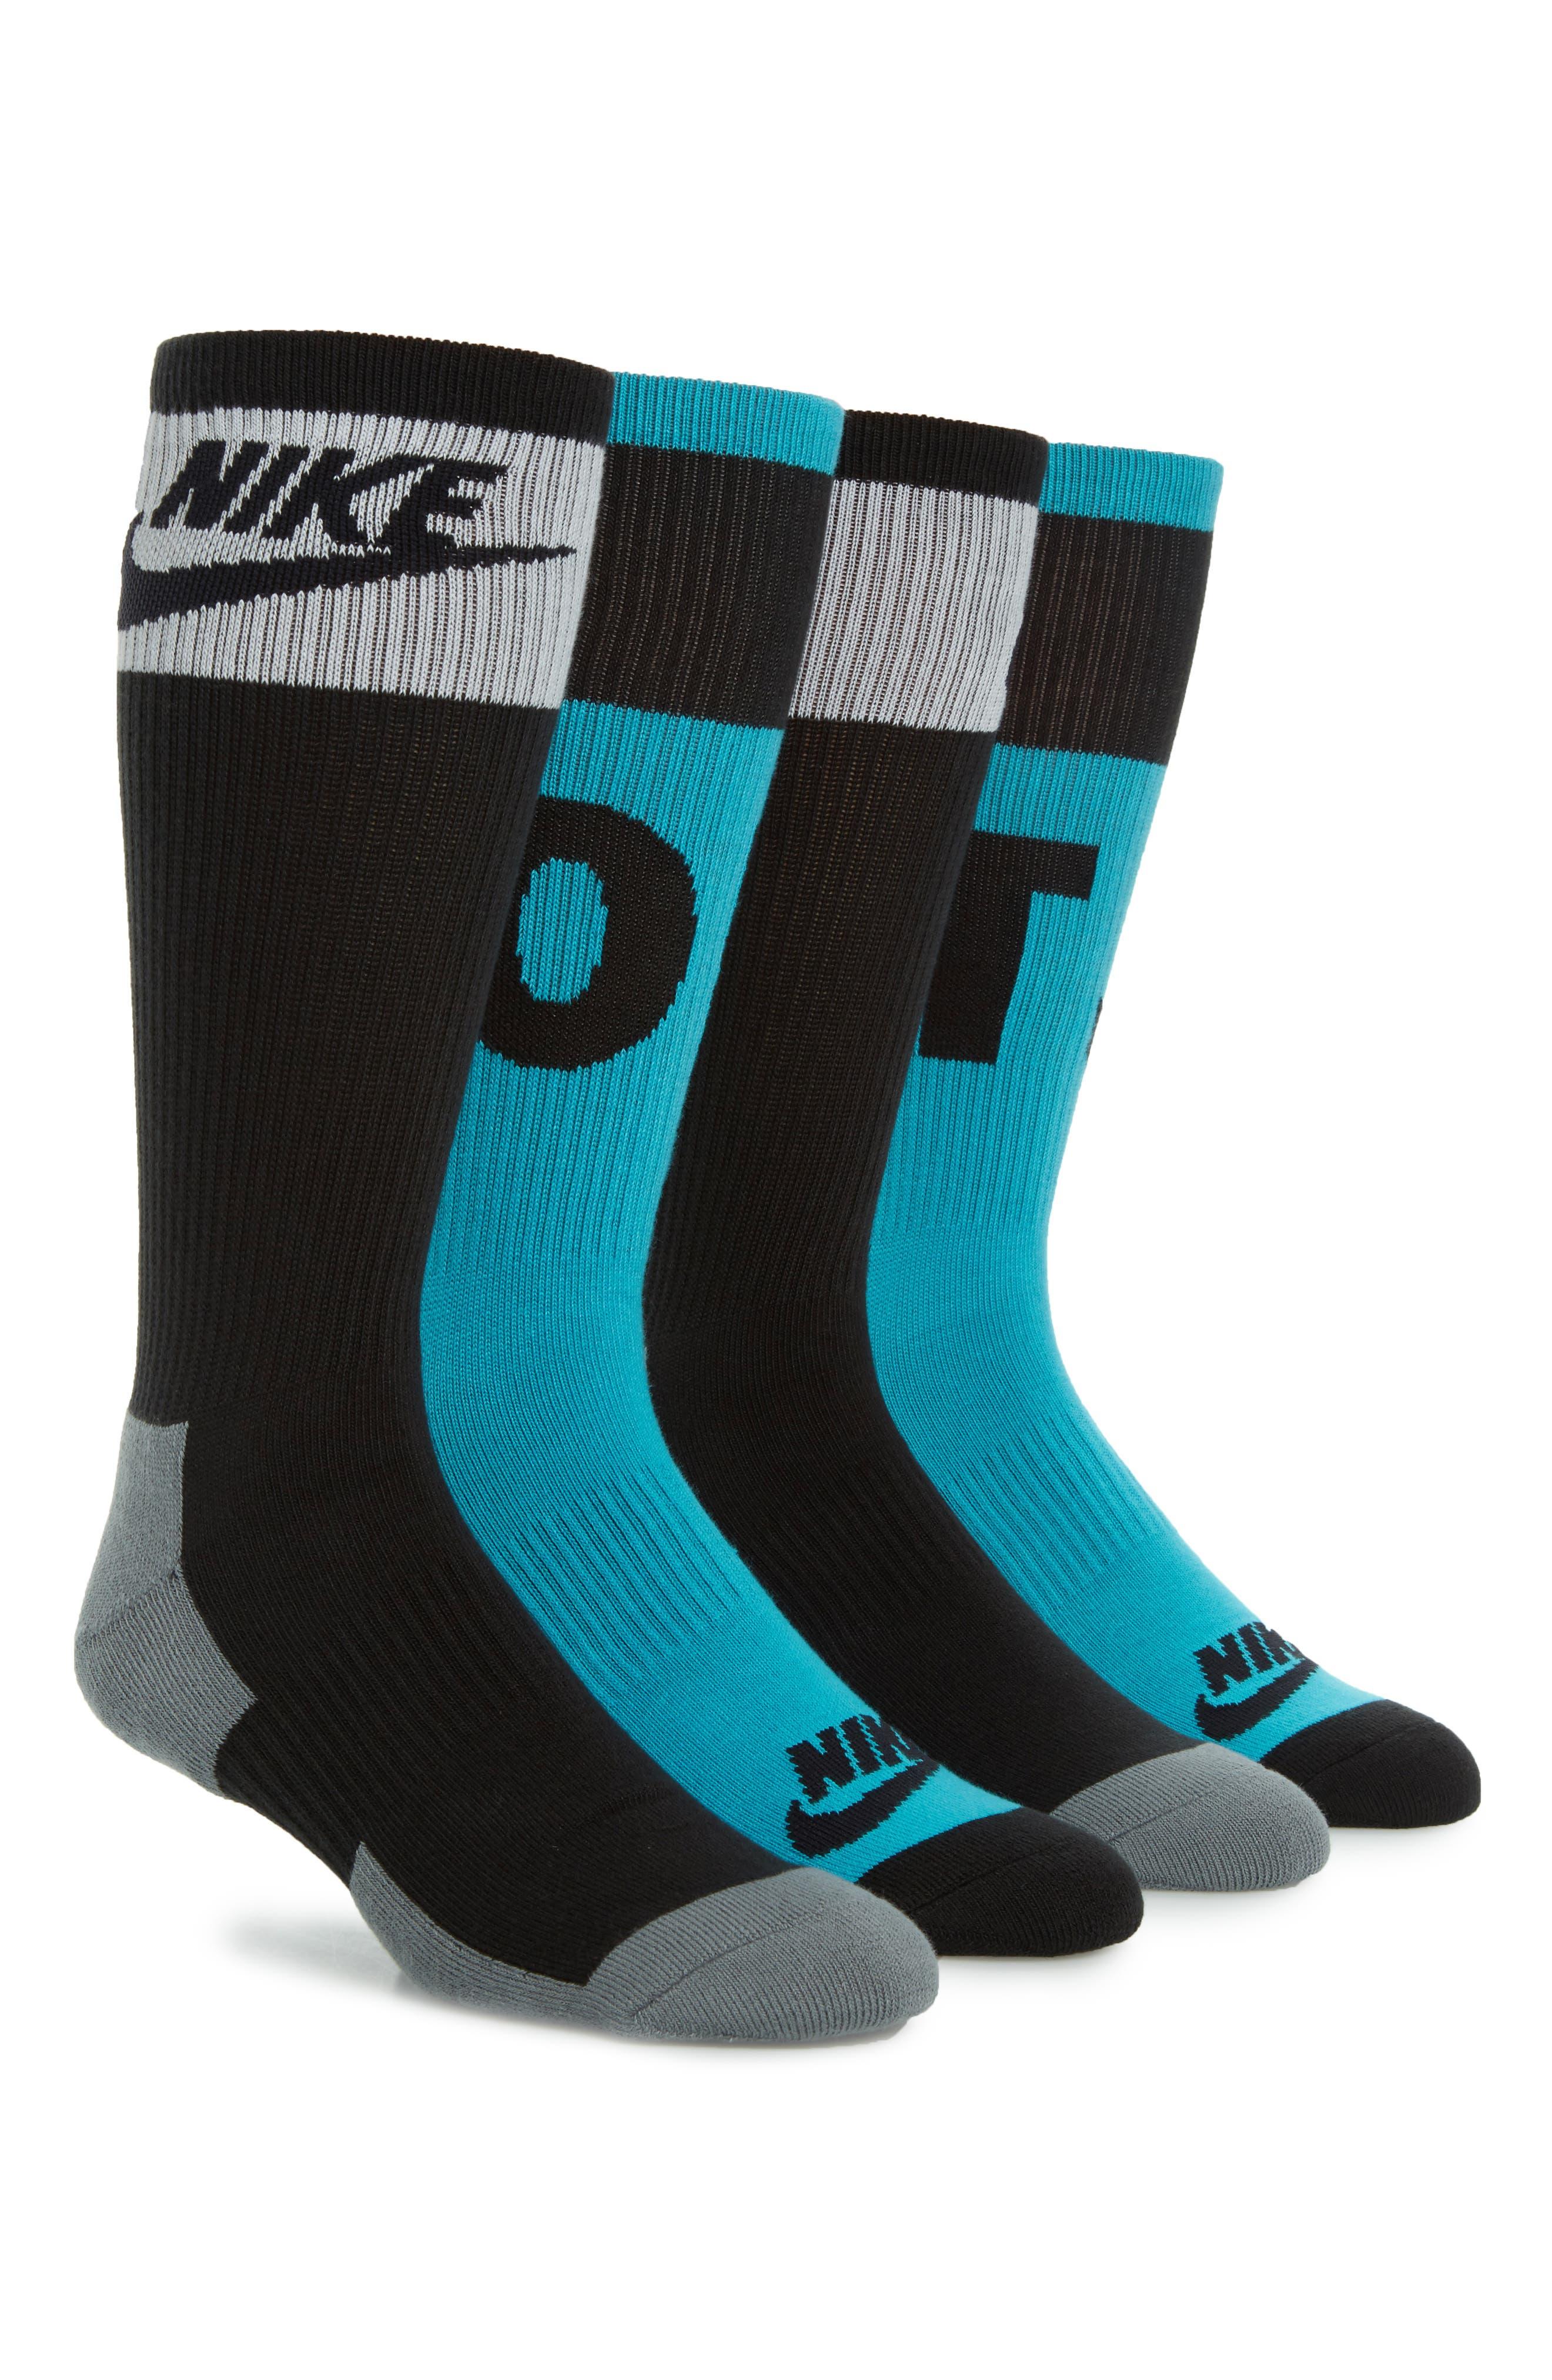 Nike HBR 2-Pack Socks